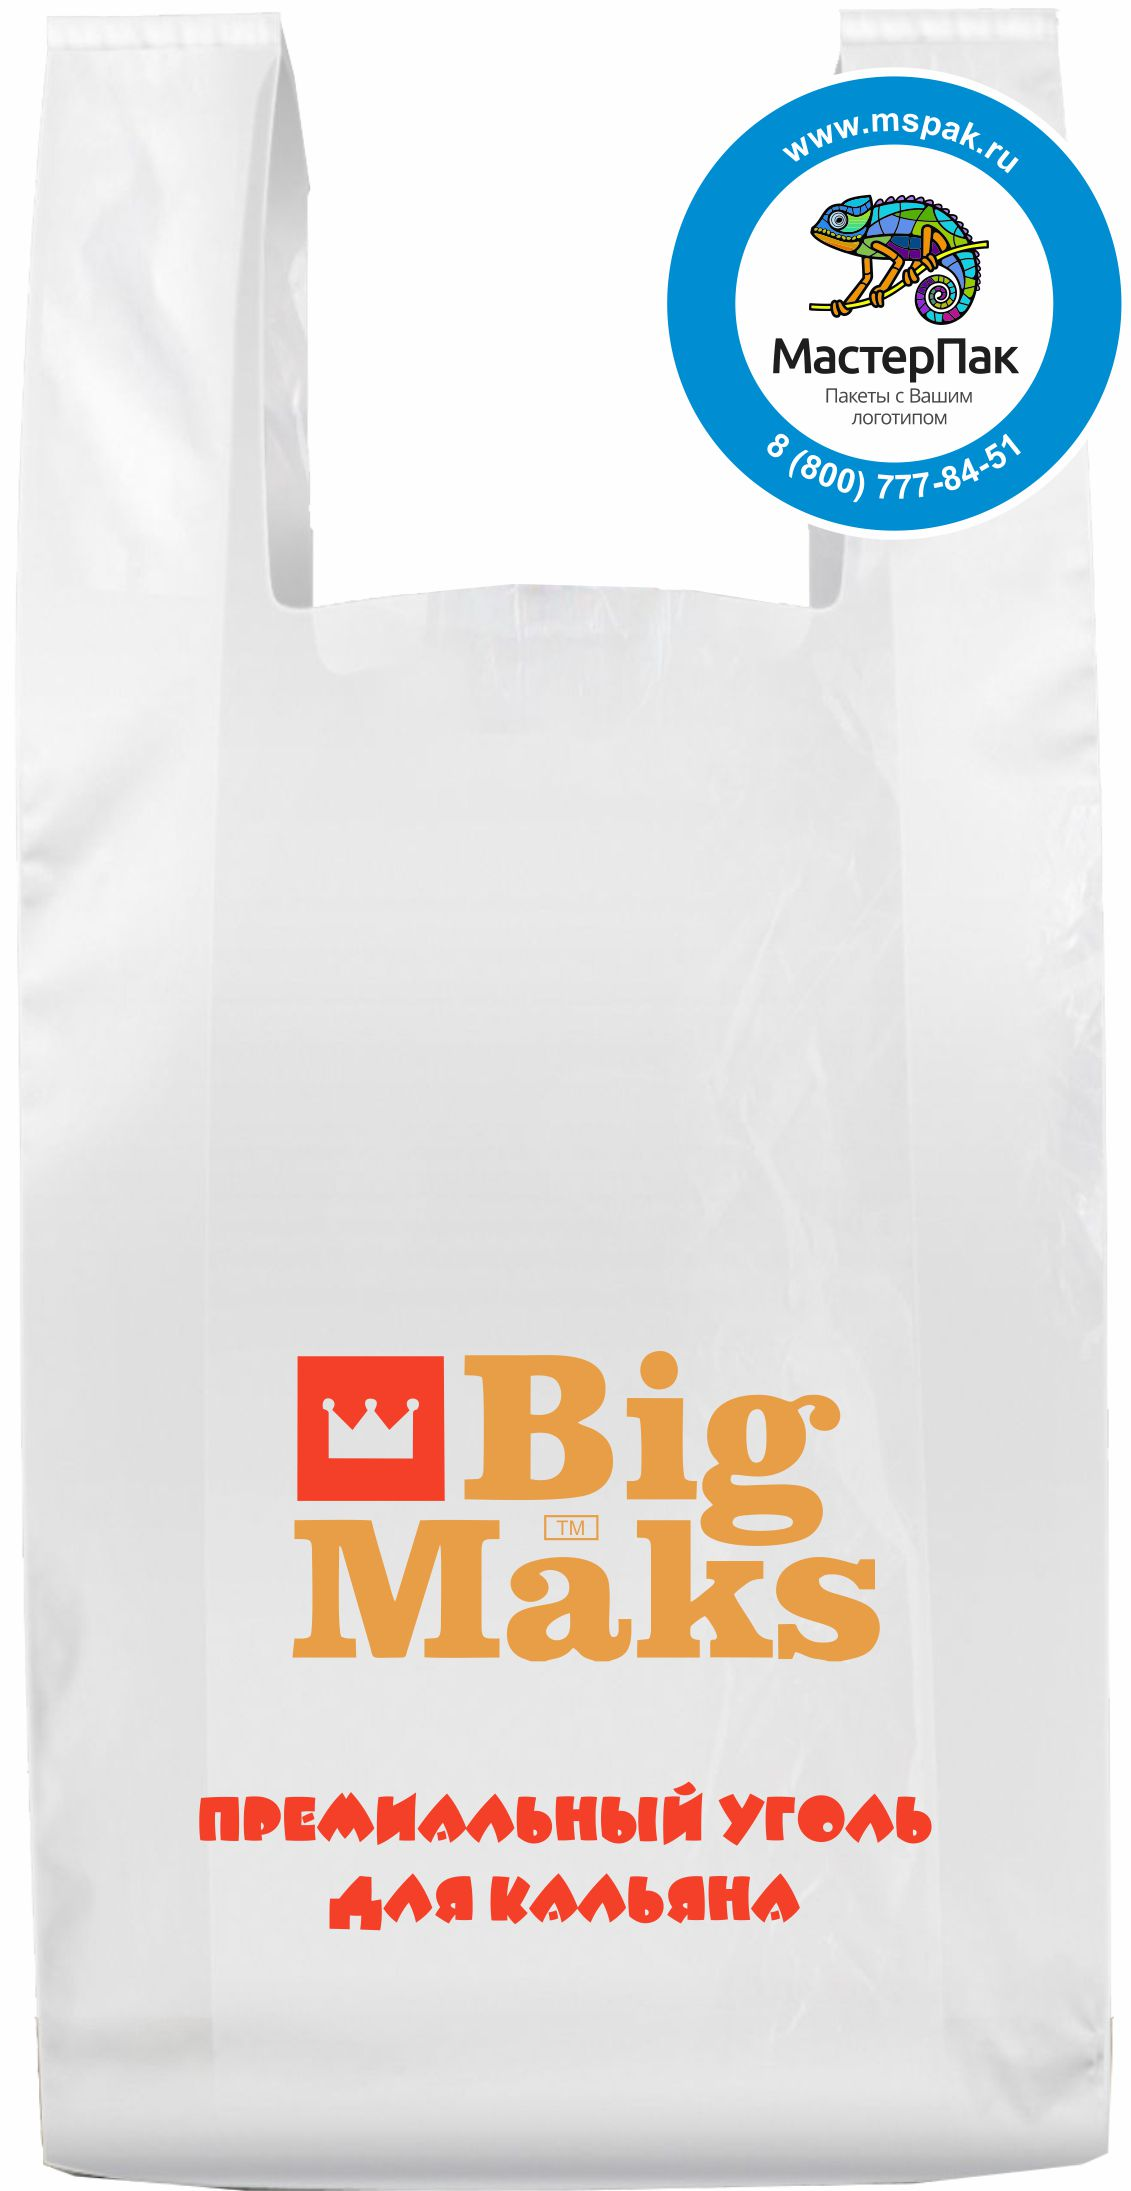 Пакет-майка ПНД с логотипом магазина Big Maks, Москва (флексопечать)